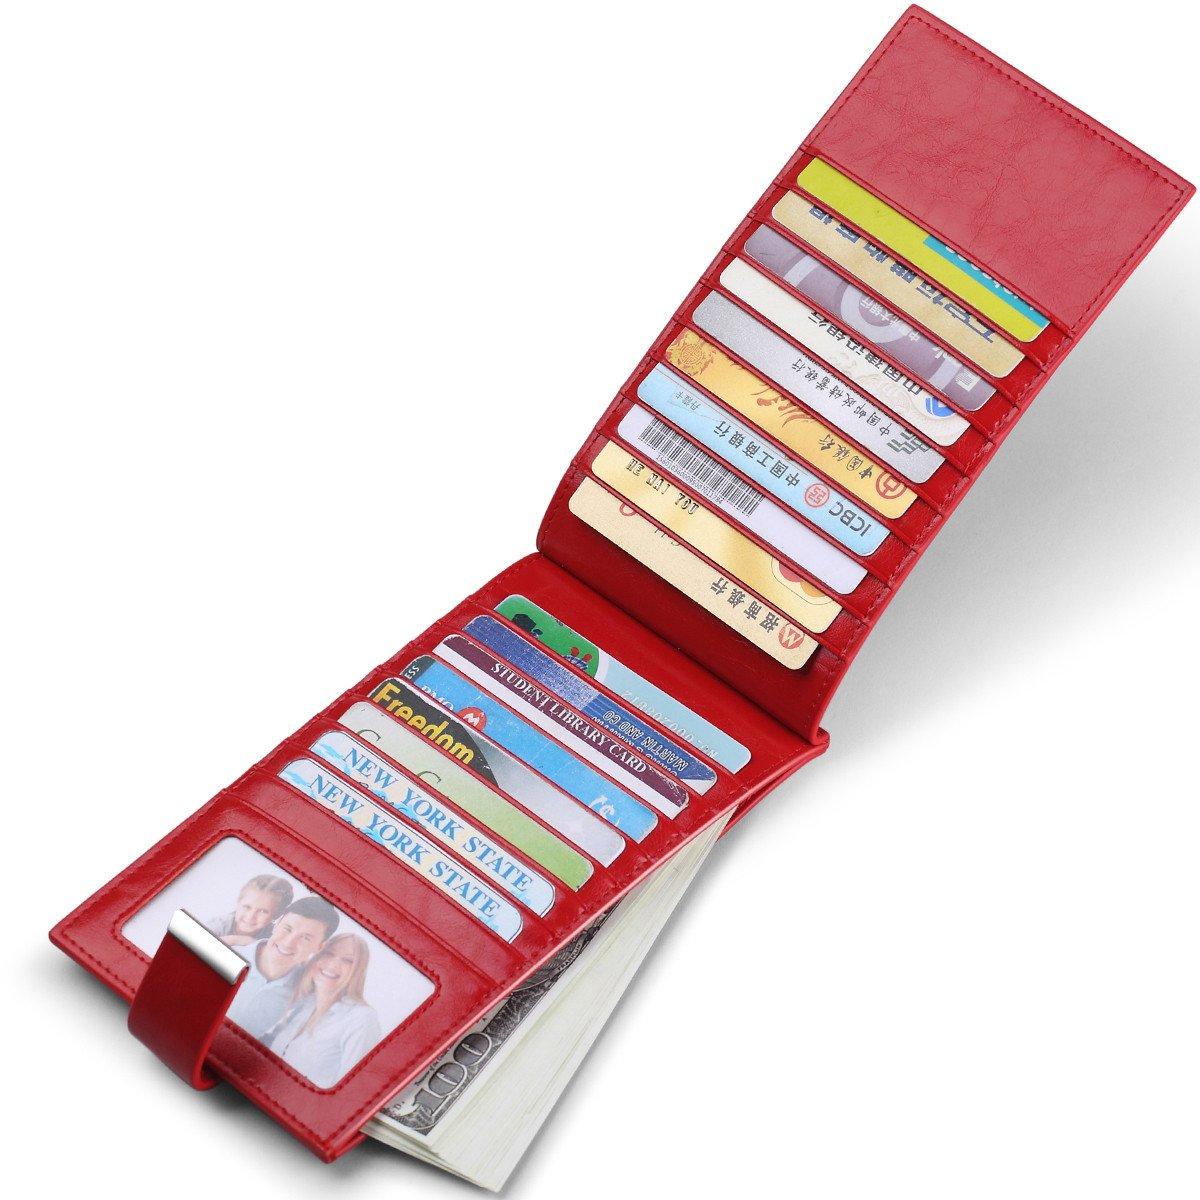 JEEBURYEE Womens Wallet RFID Blocking Multi Credit Card Holder Genuine Leather Long Bifold Clutch Travel Purse with ID Window Red